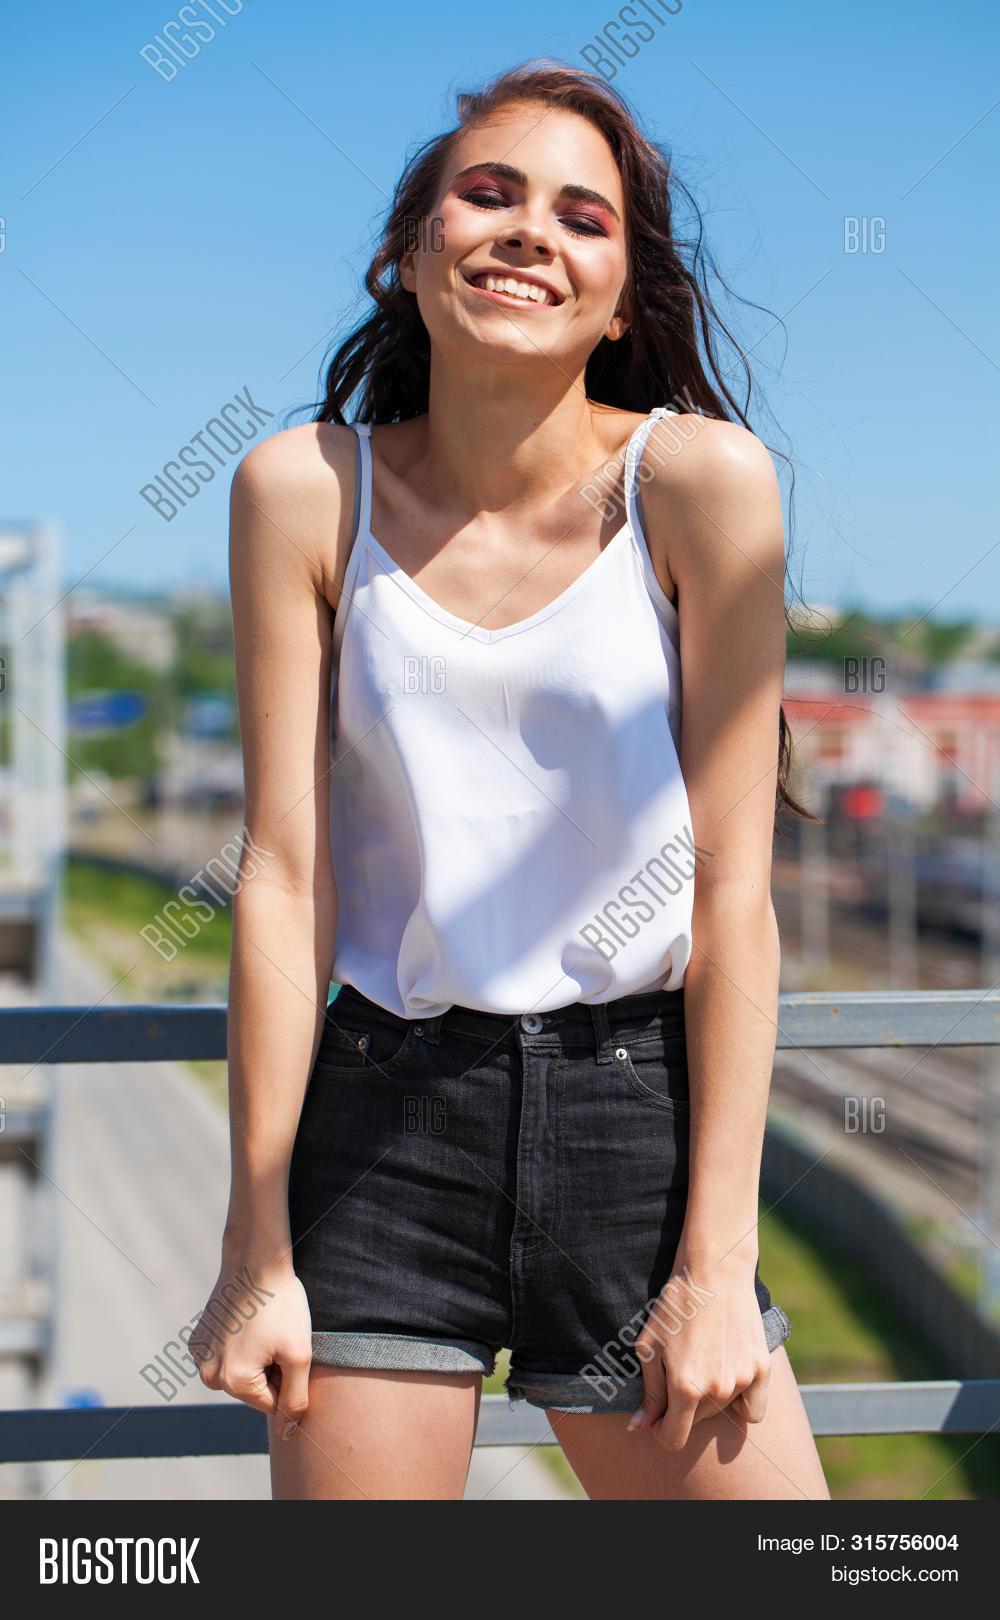 Adhone Salmon Sushi Mans Tank Top T-Shirts Sports Sleeveless Vest White